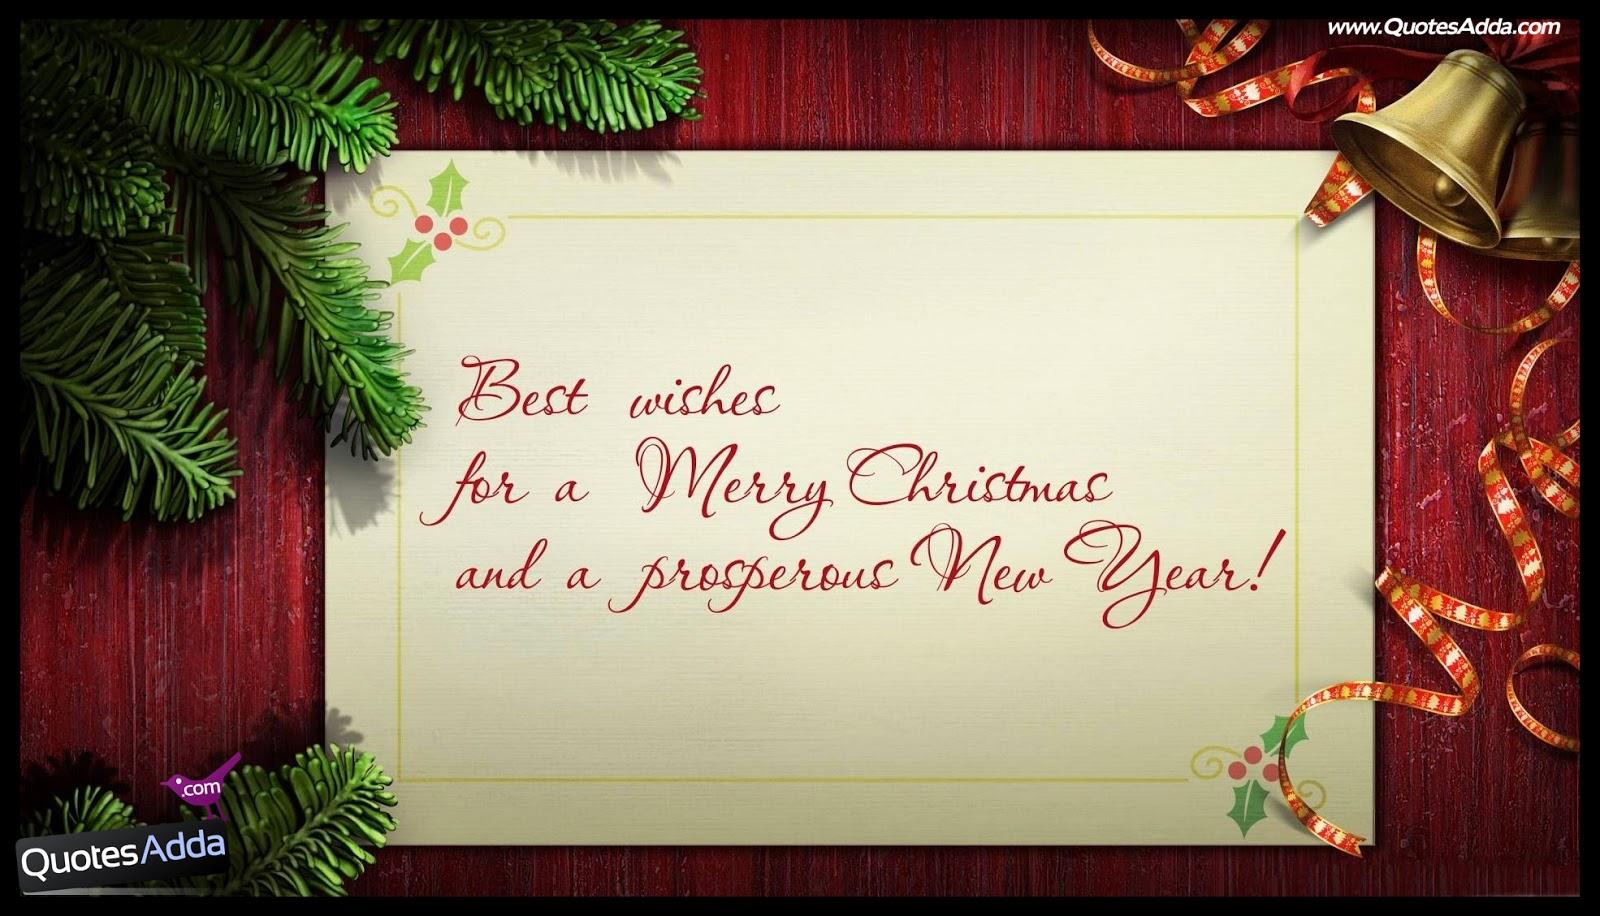 Merry Christmas Greeting Cards in English  QuotesAdda.com  Telugu Quotes  ...